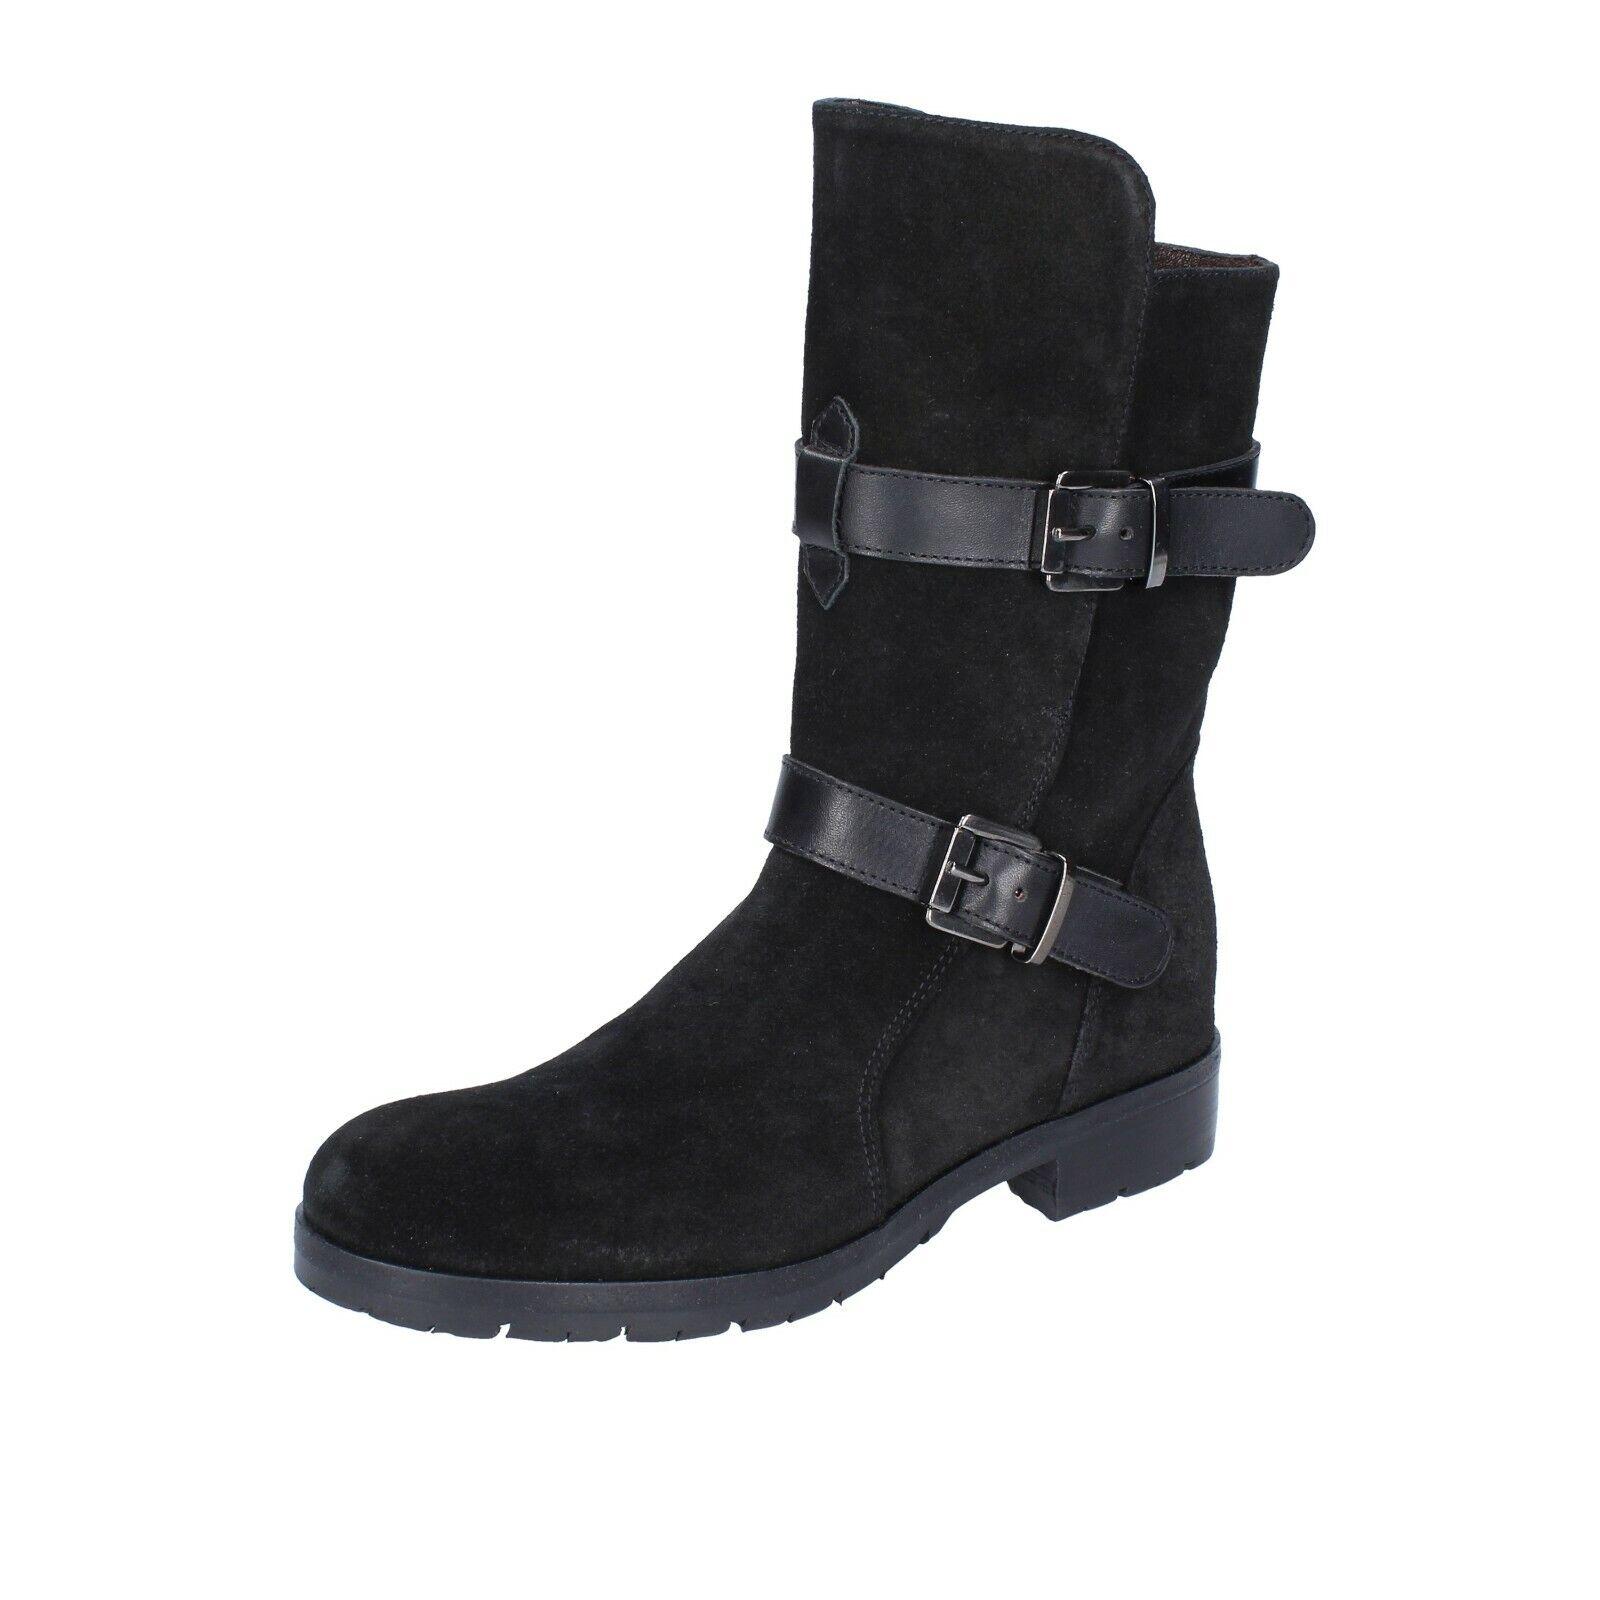 Chaussures Femmes TRIVER FLIGHT 37 UE bottines noir daim br206-37